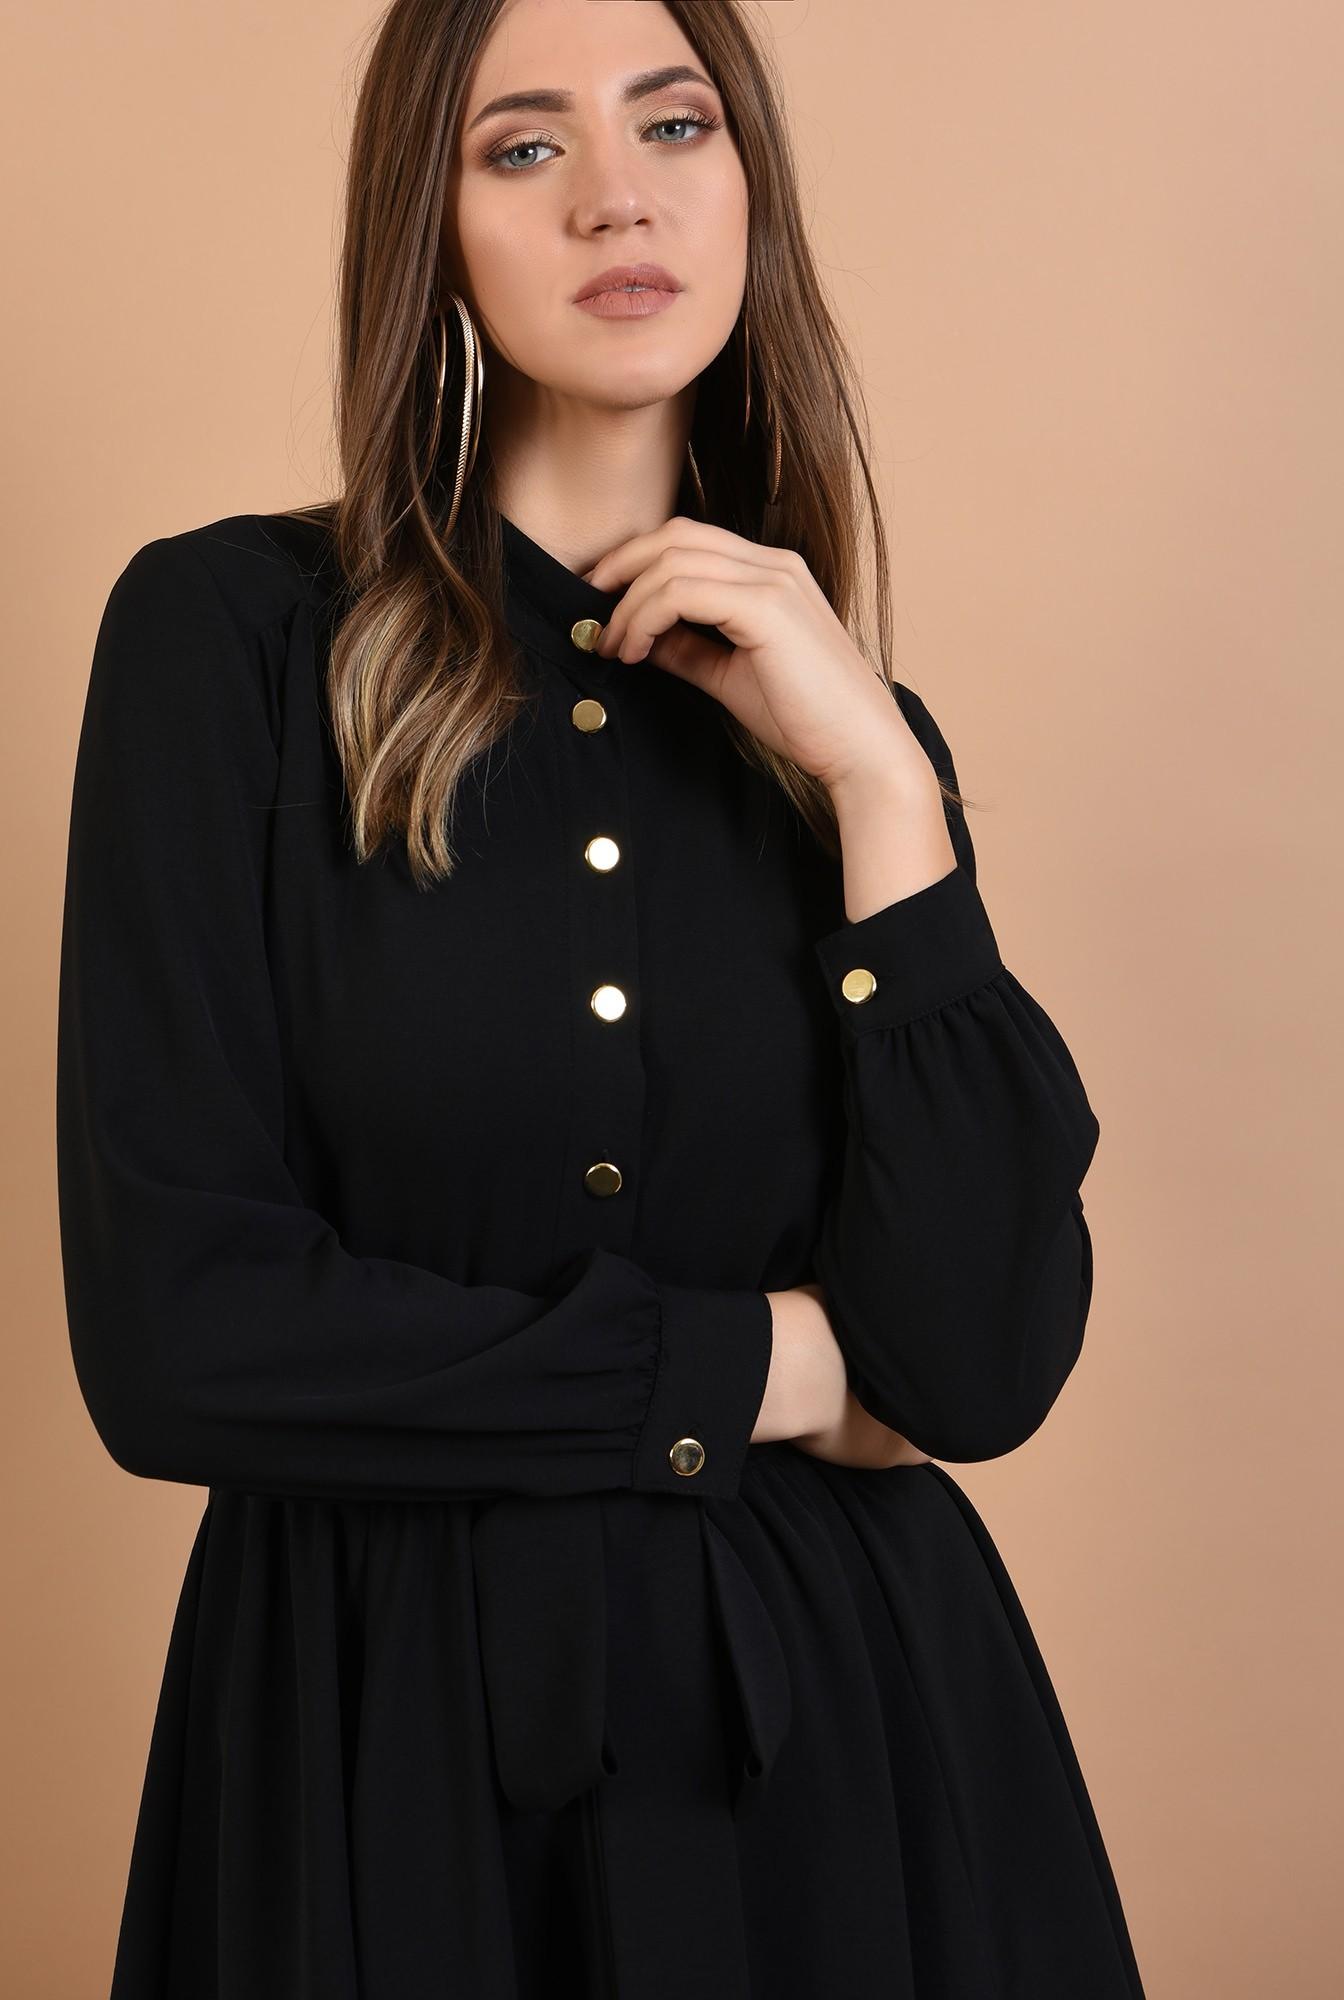 2 - rochie neagra, scurta, cu nasturi, cordon, Poema